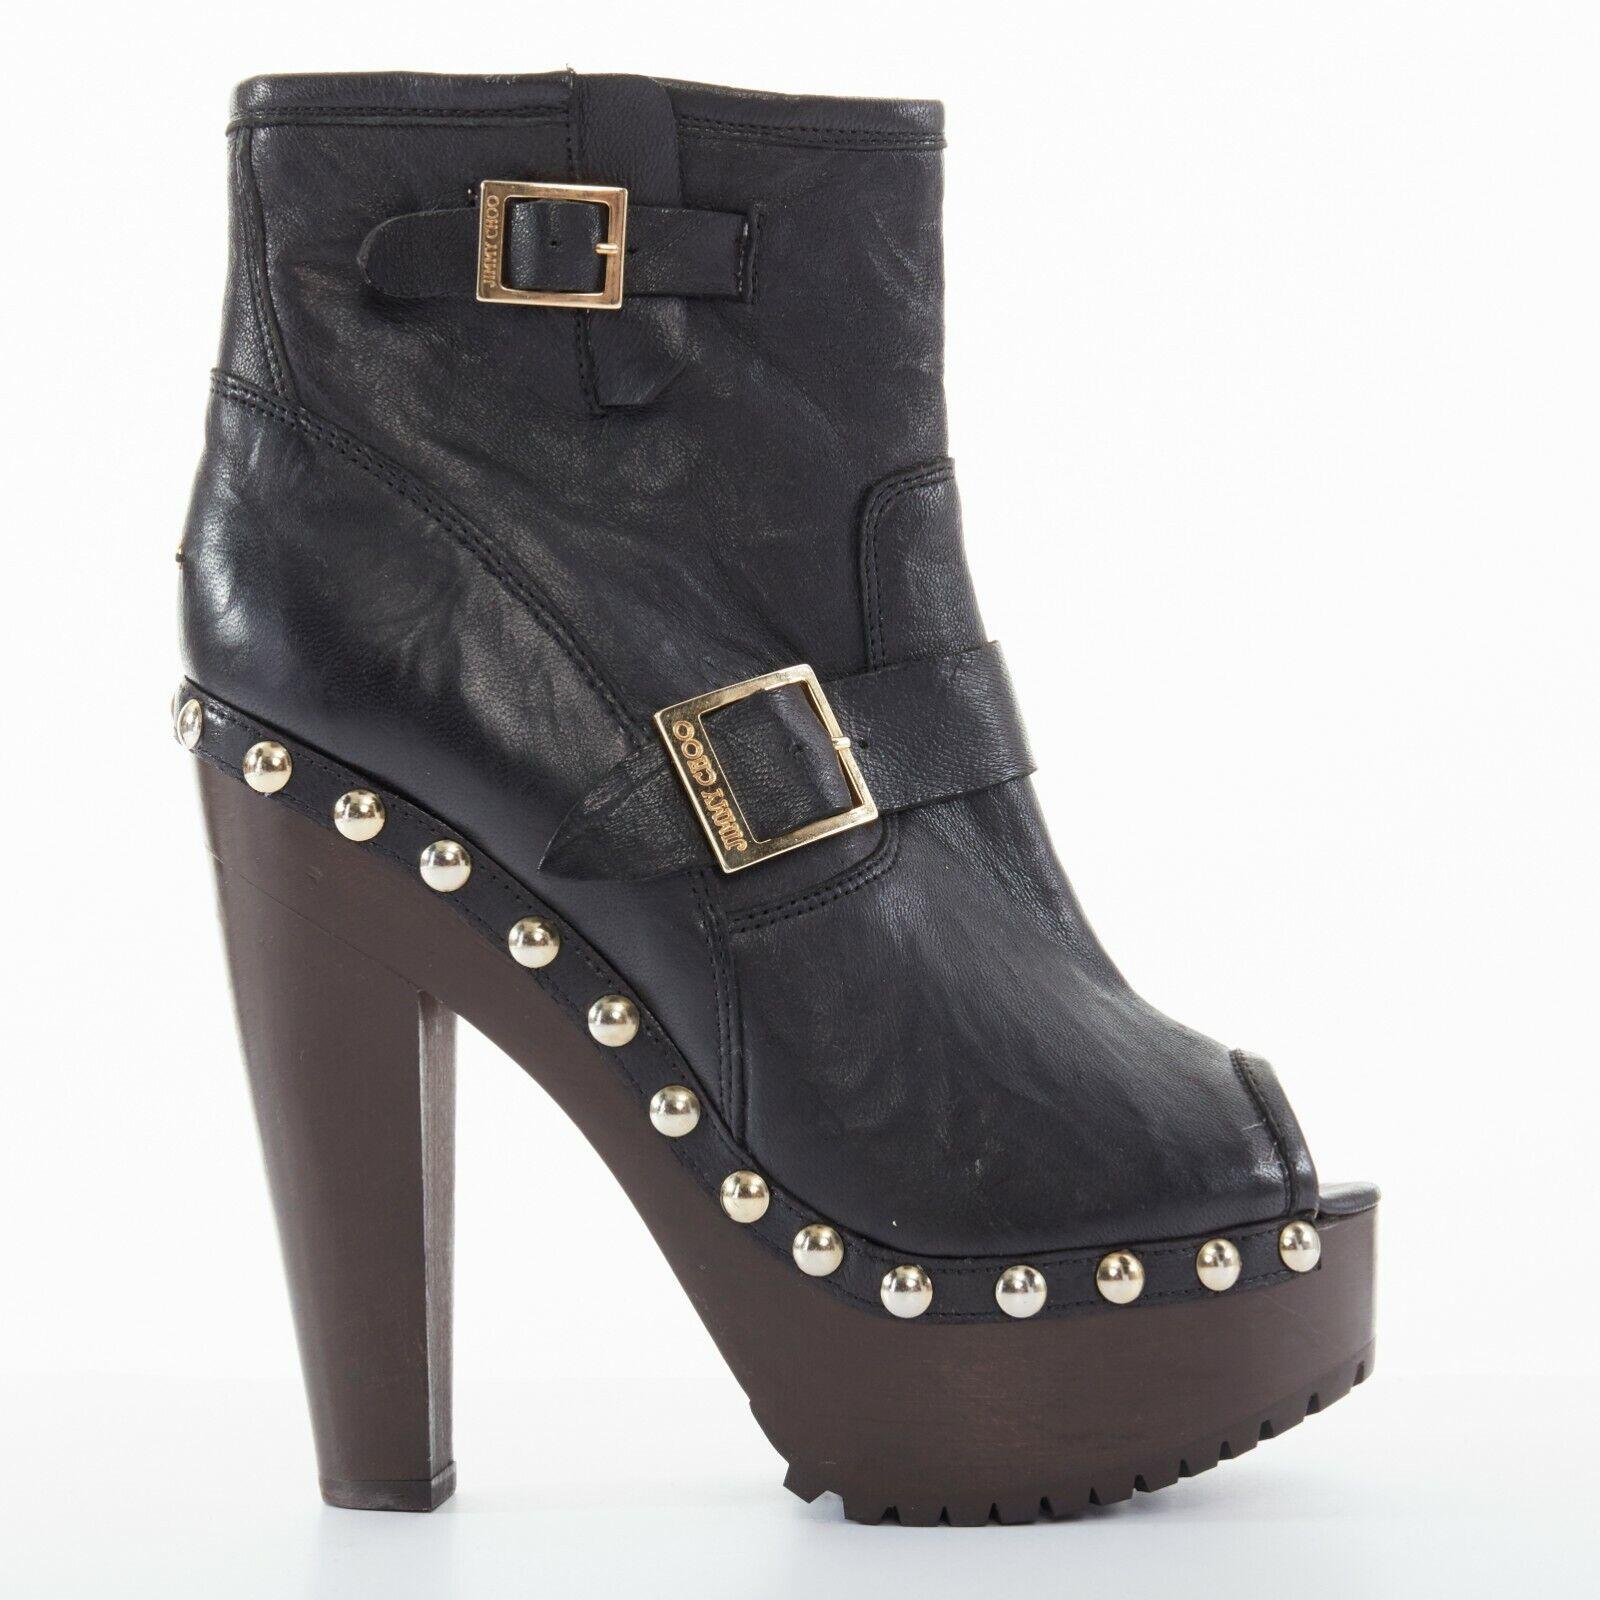 New JIMMY CHOO black leather peep toe wooden platform buckled ankle boots EU39